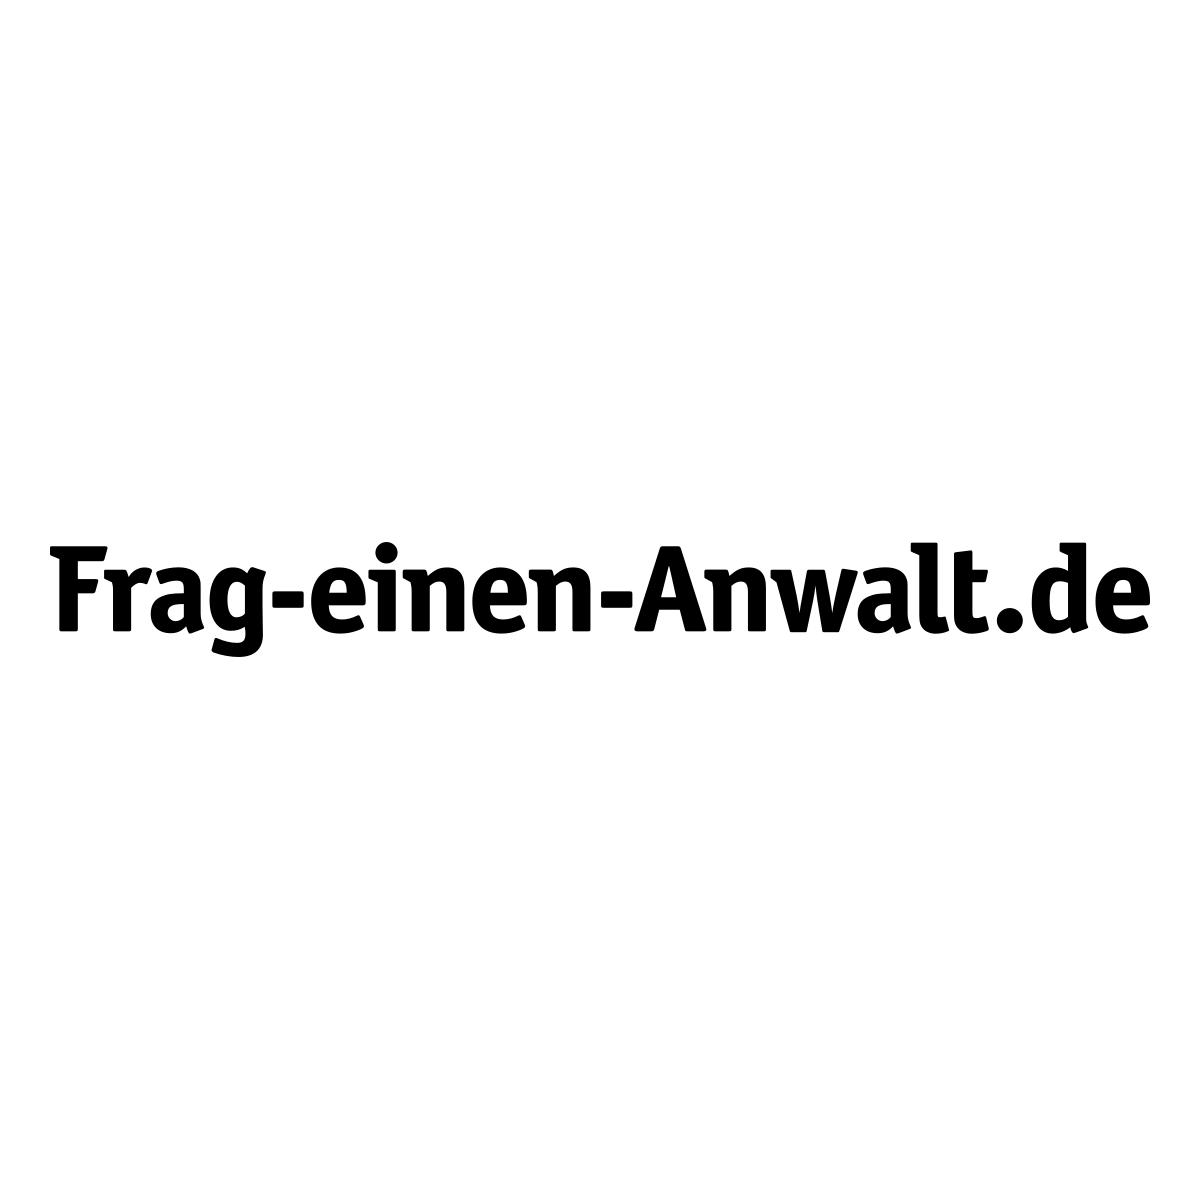 www.frag-einen-anwalt.de